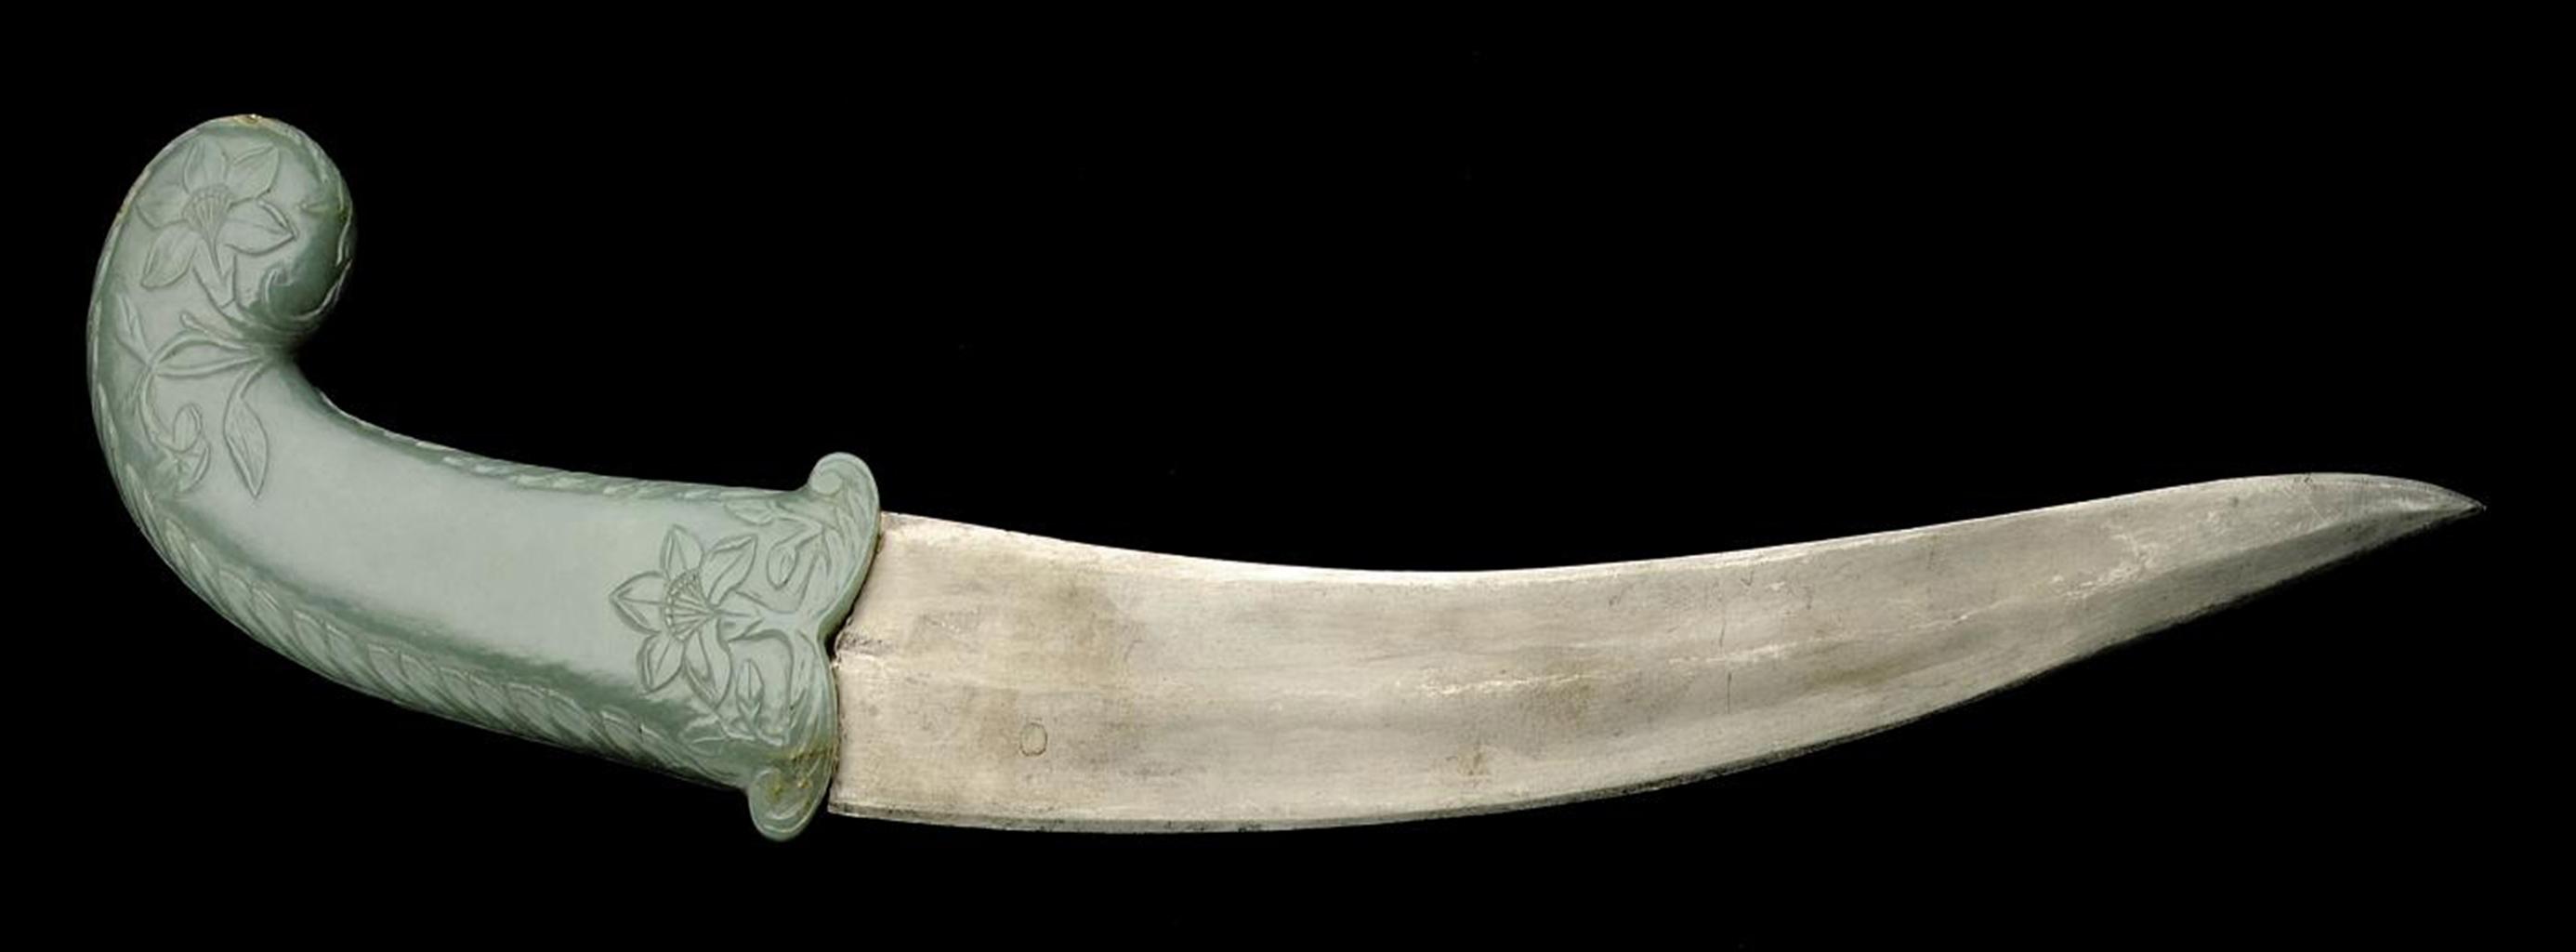 A Mughal Celadon Jade Dagger Handle 17th 18th Century